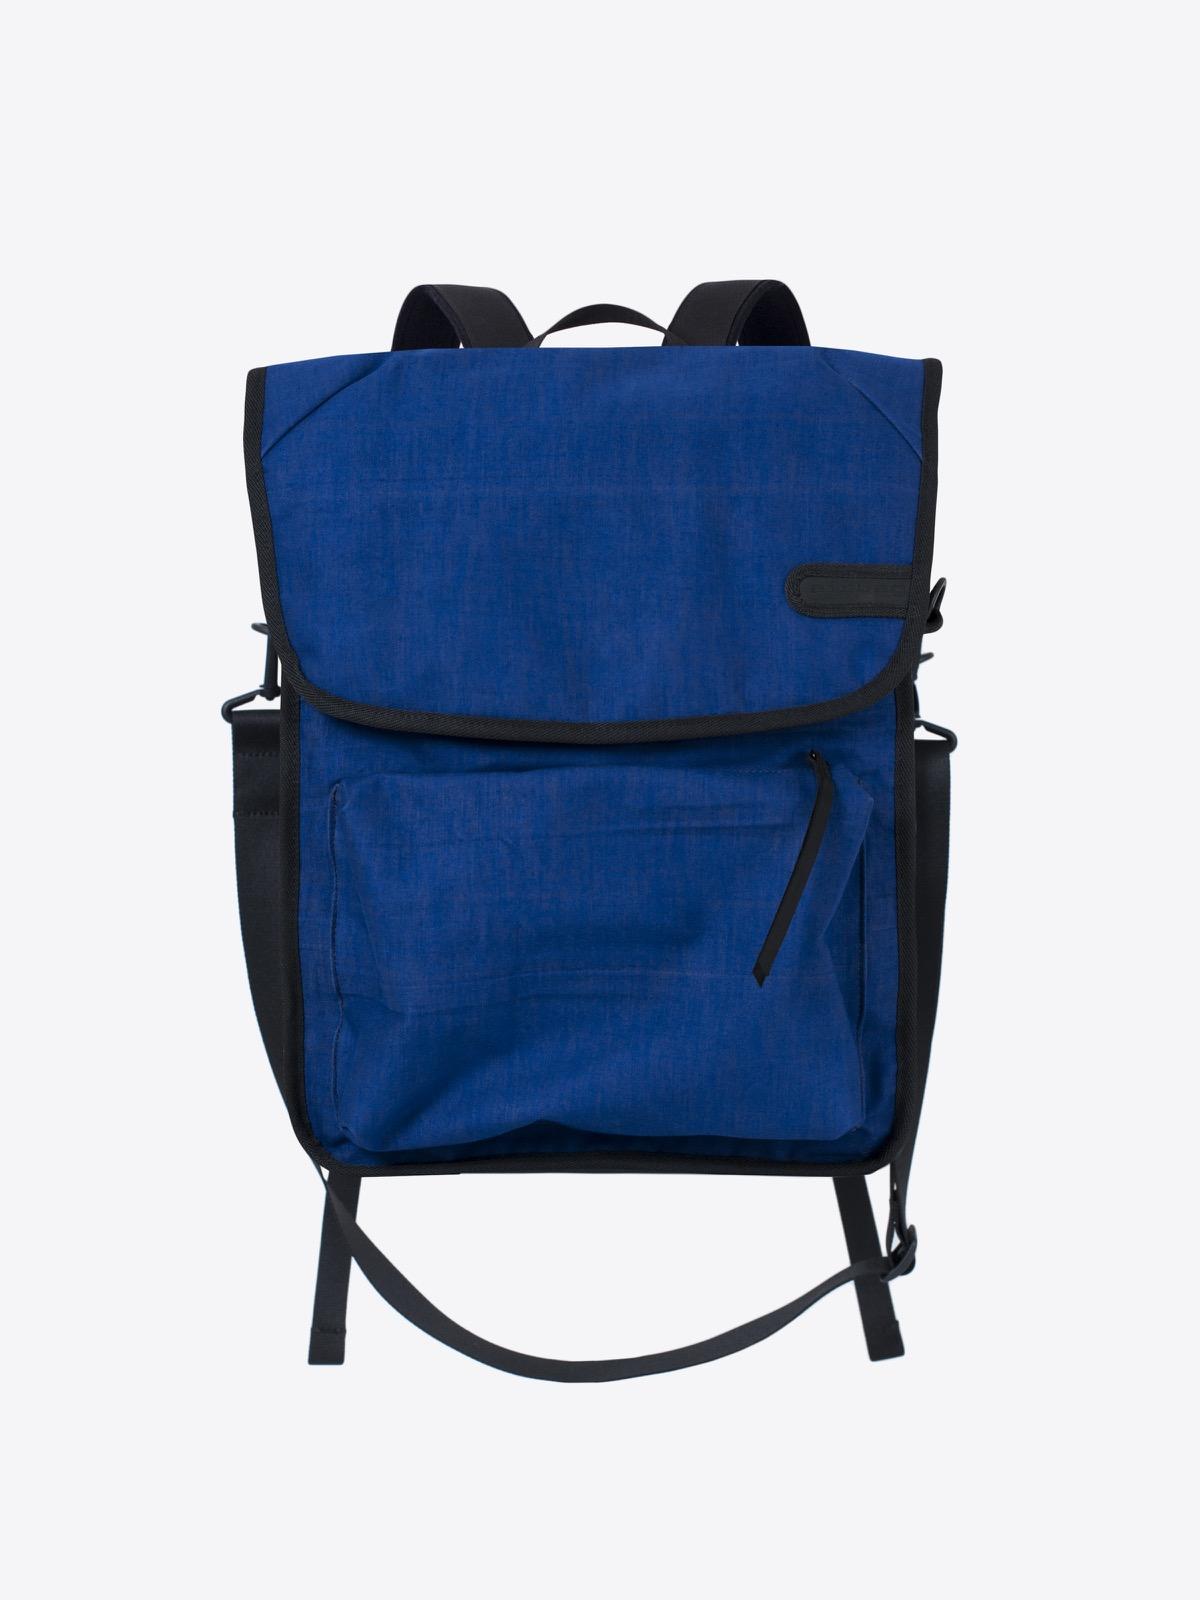 airbag craftworks 801